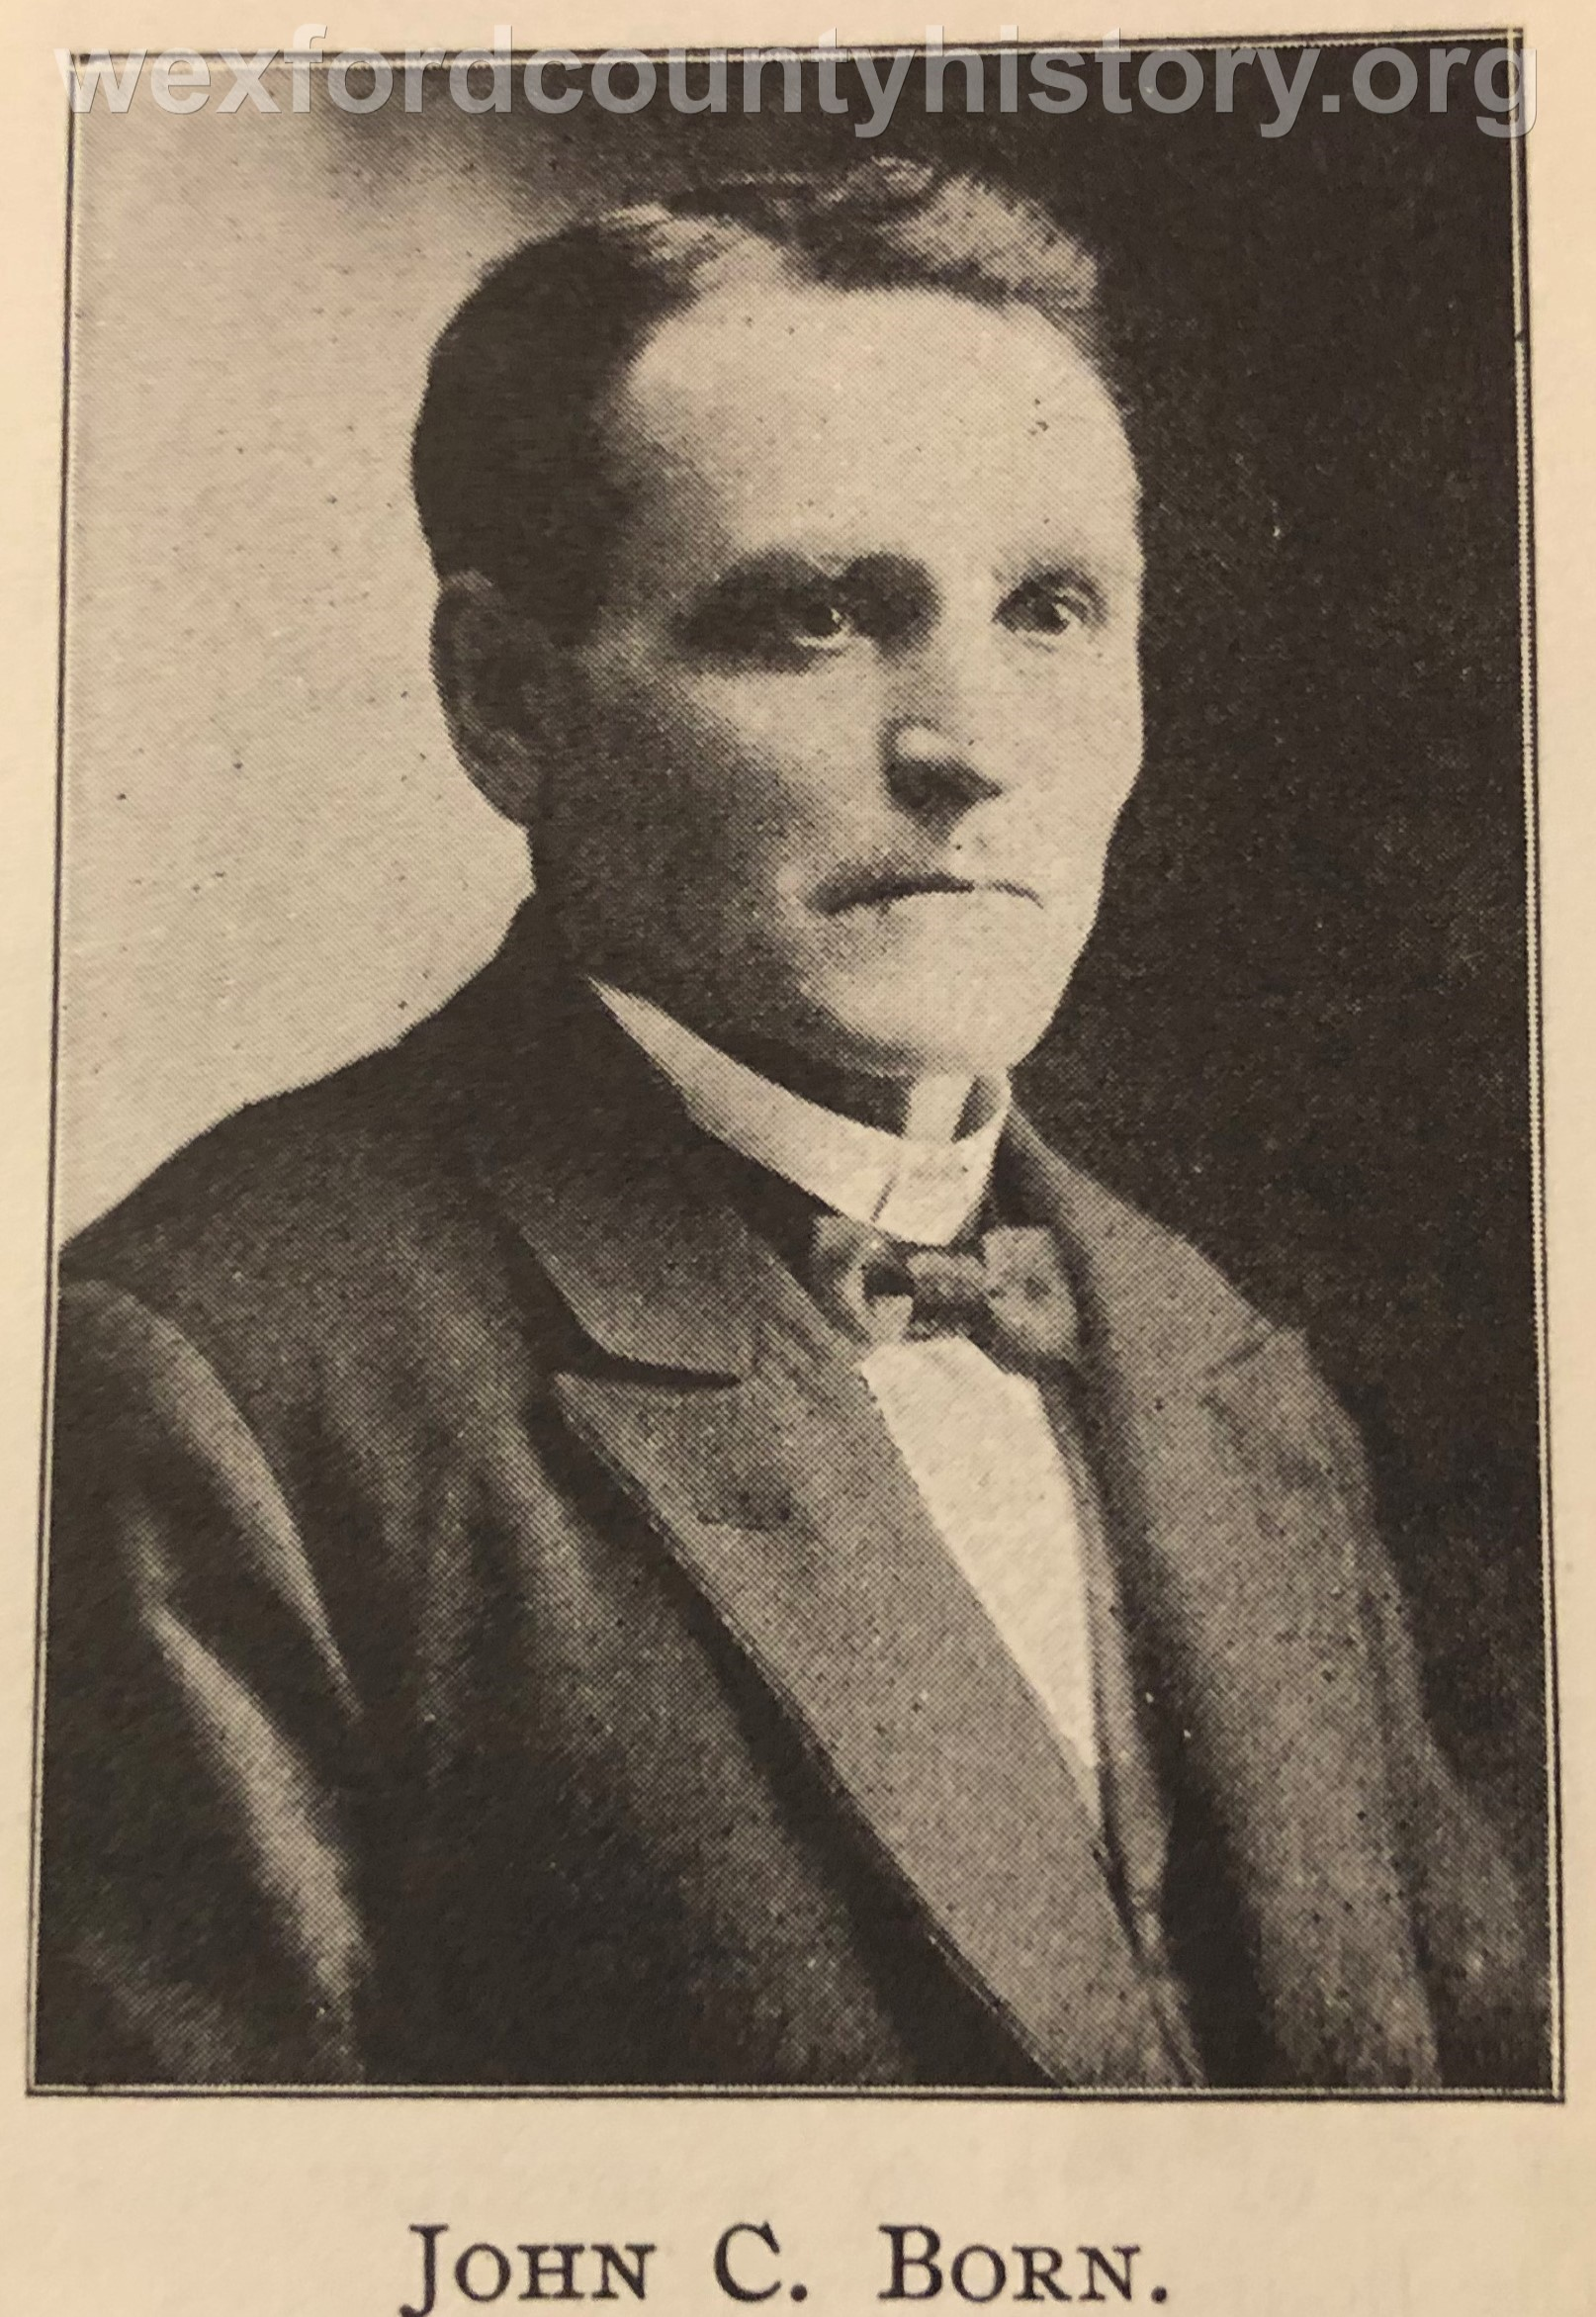 John C. Born